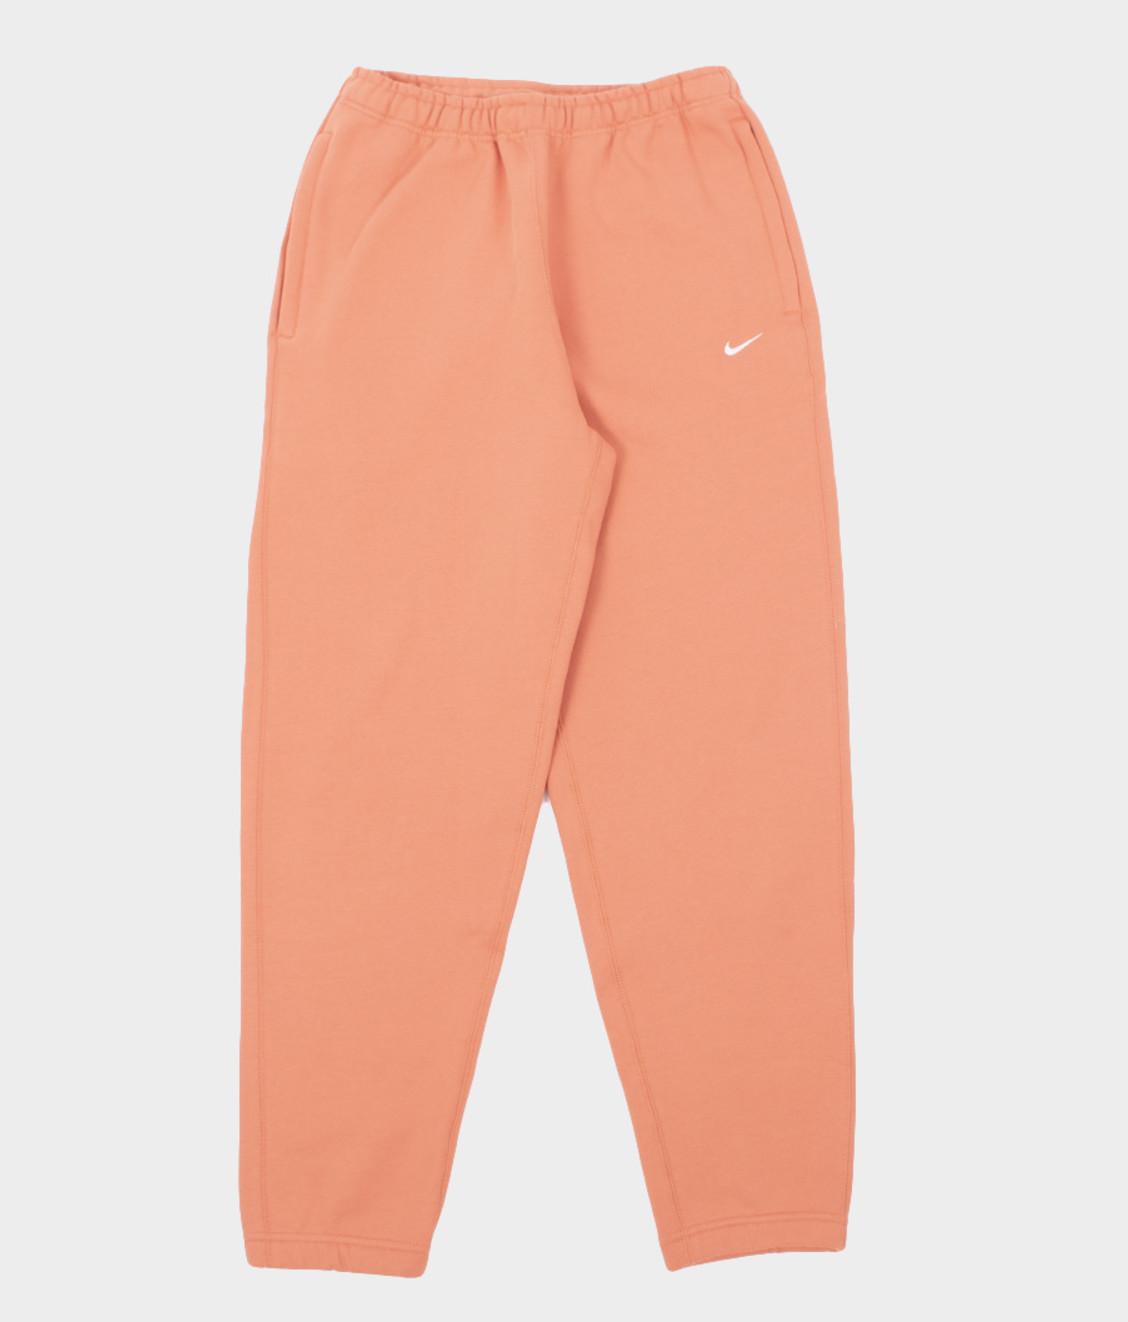 Nike Nike NRG pant Healing Orange